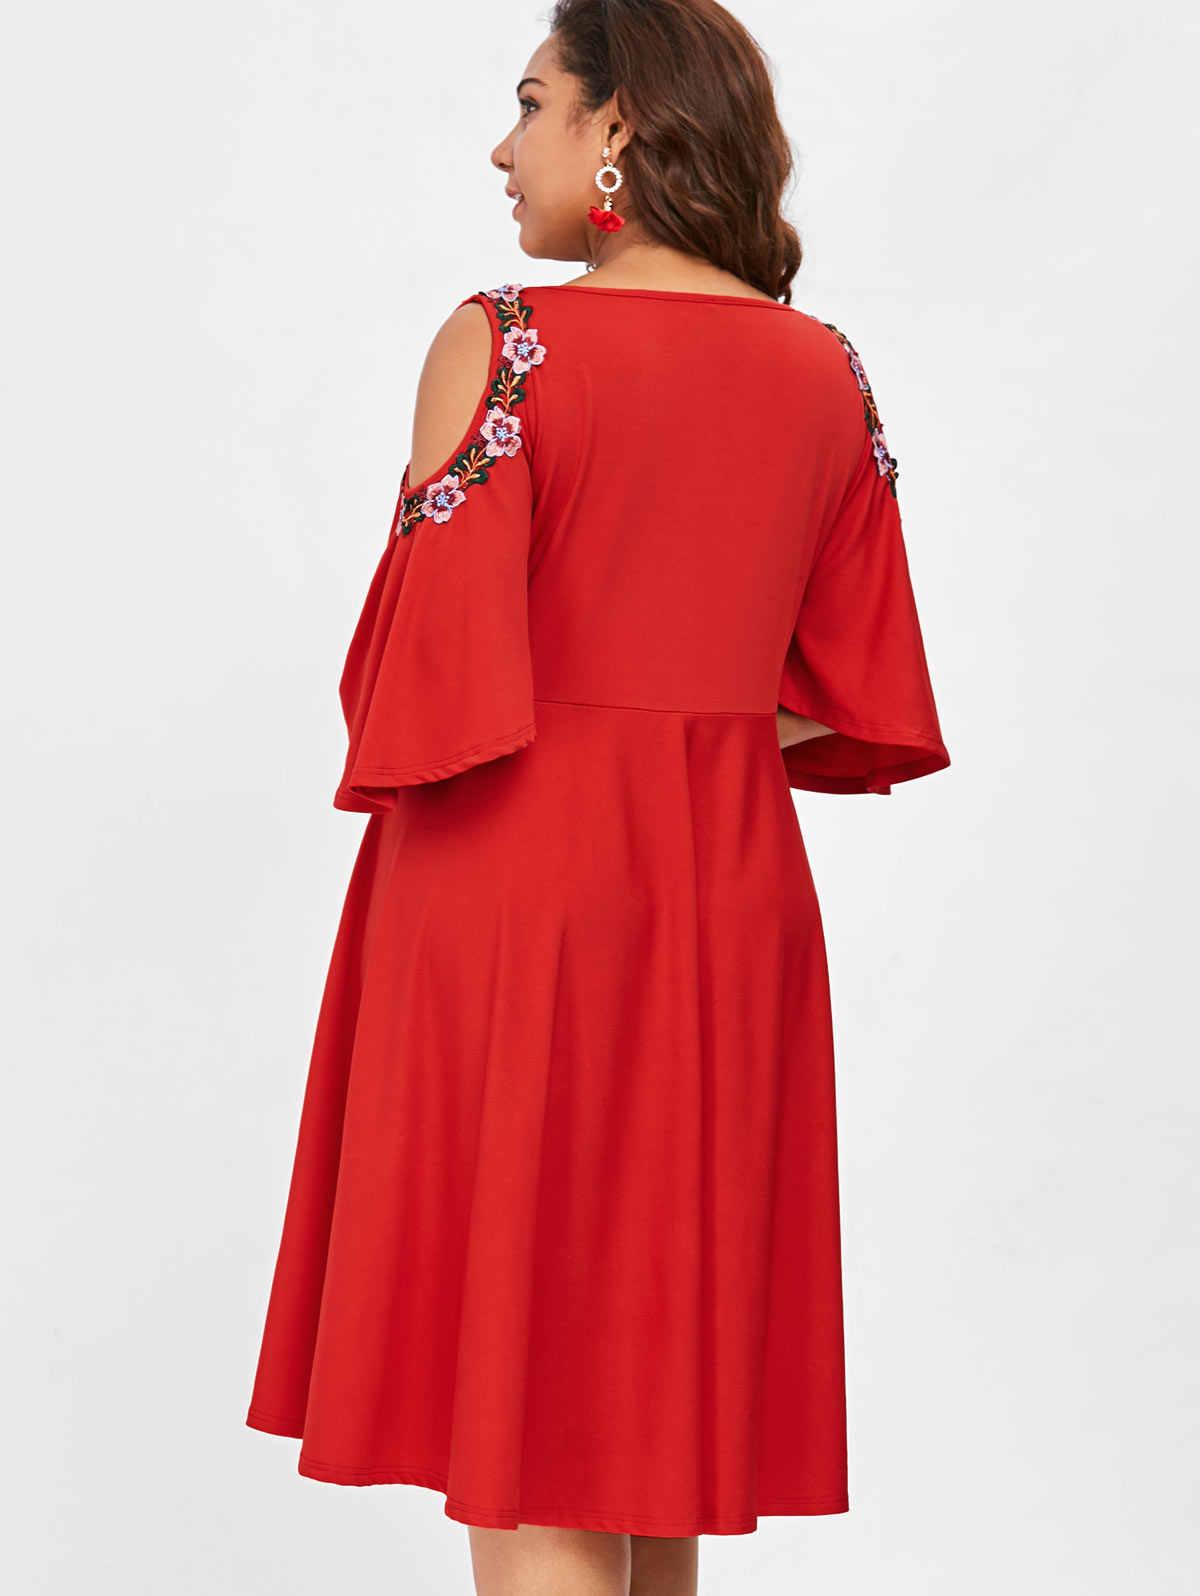 d9198ba05a2d3 Wipalo Plus Size 5XL Floral Embroidery A-Line Dress Casual V-Neck Knee  Length Cold Shoulder Dress Women Spring Summer Vestidos